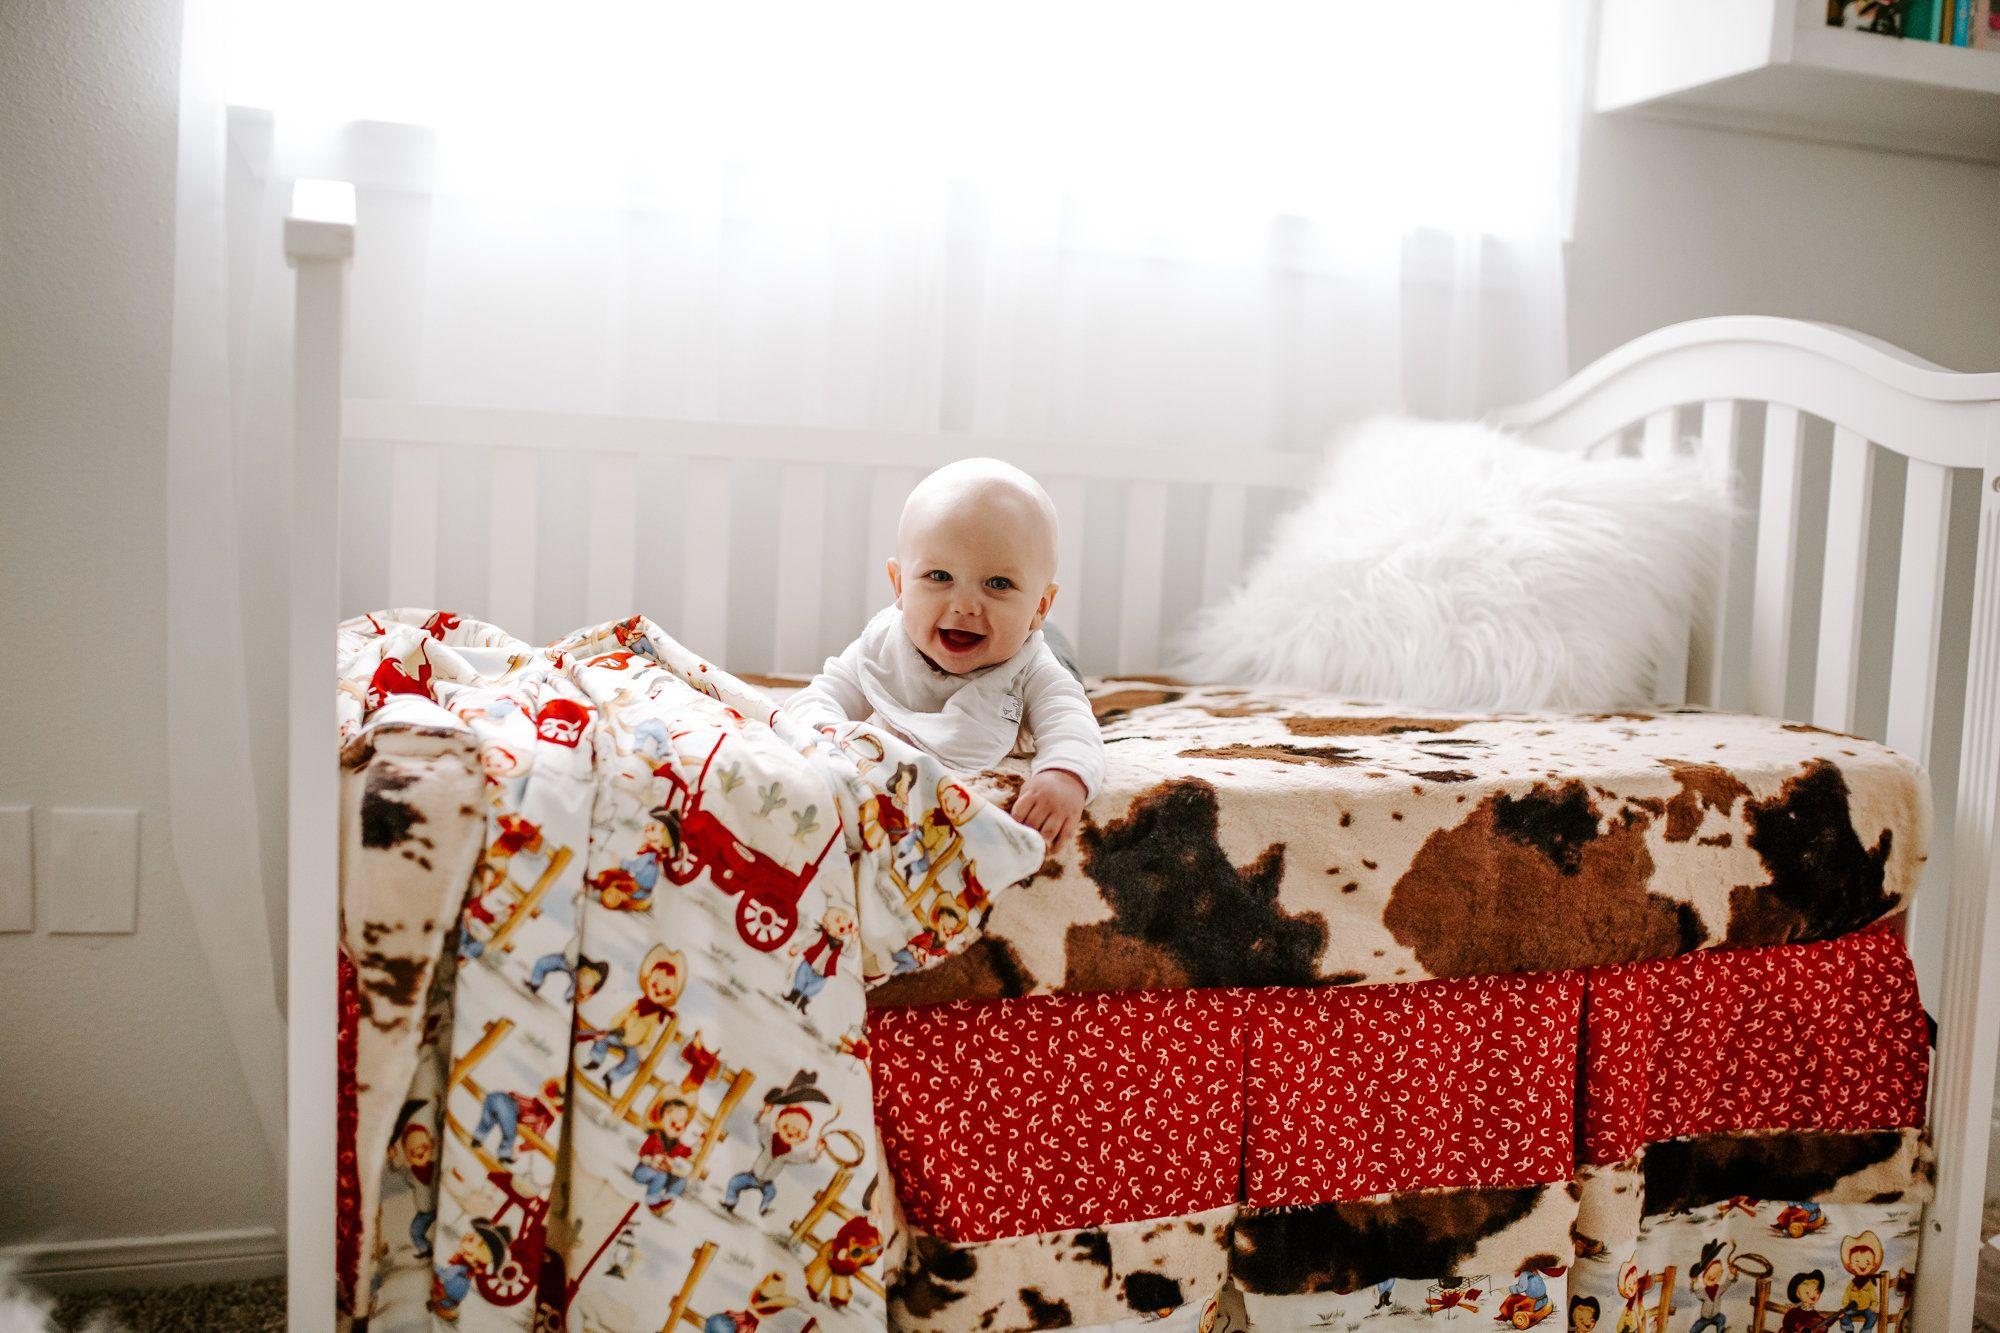 Western Cowboy Toddler Crib Bedding Set Minky Crib Sheet Changing Pad Cover Unique Baby Boy Gift In 2020 Toddler Crib Baby Bedding Sets Toddler Bed Set